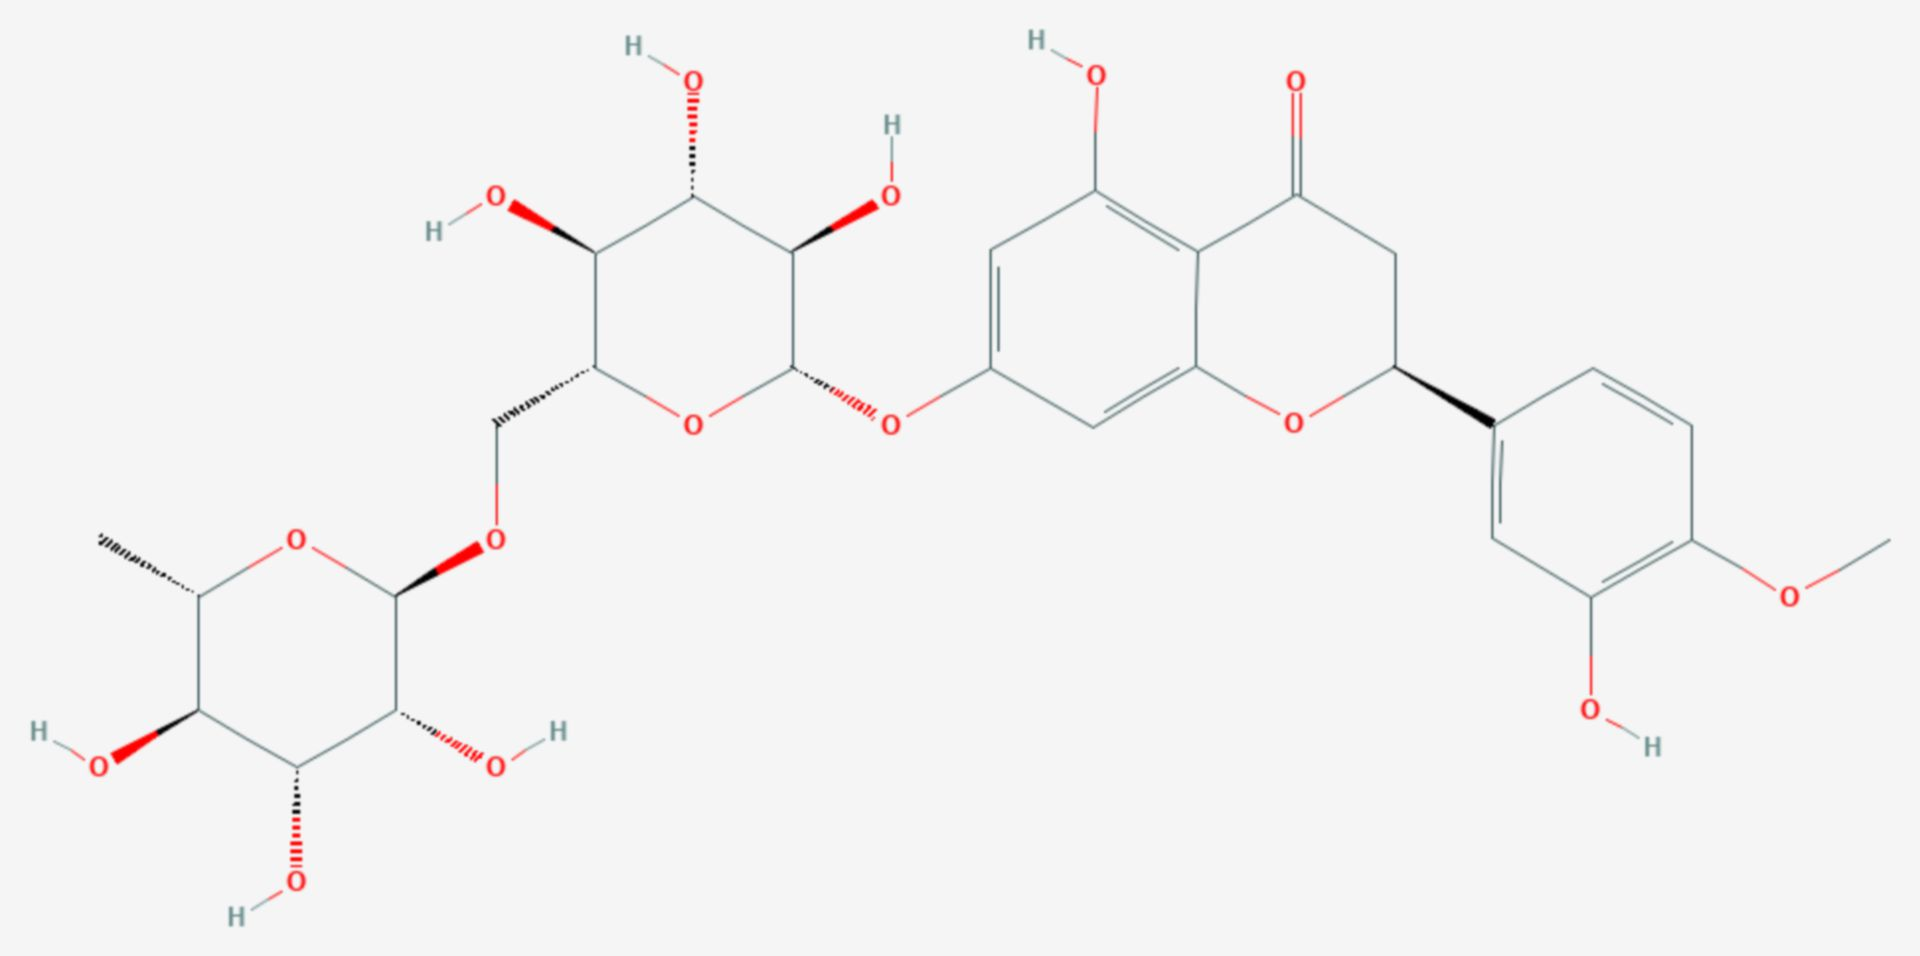 Hesperidin (Strukturformel)